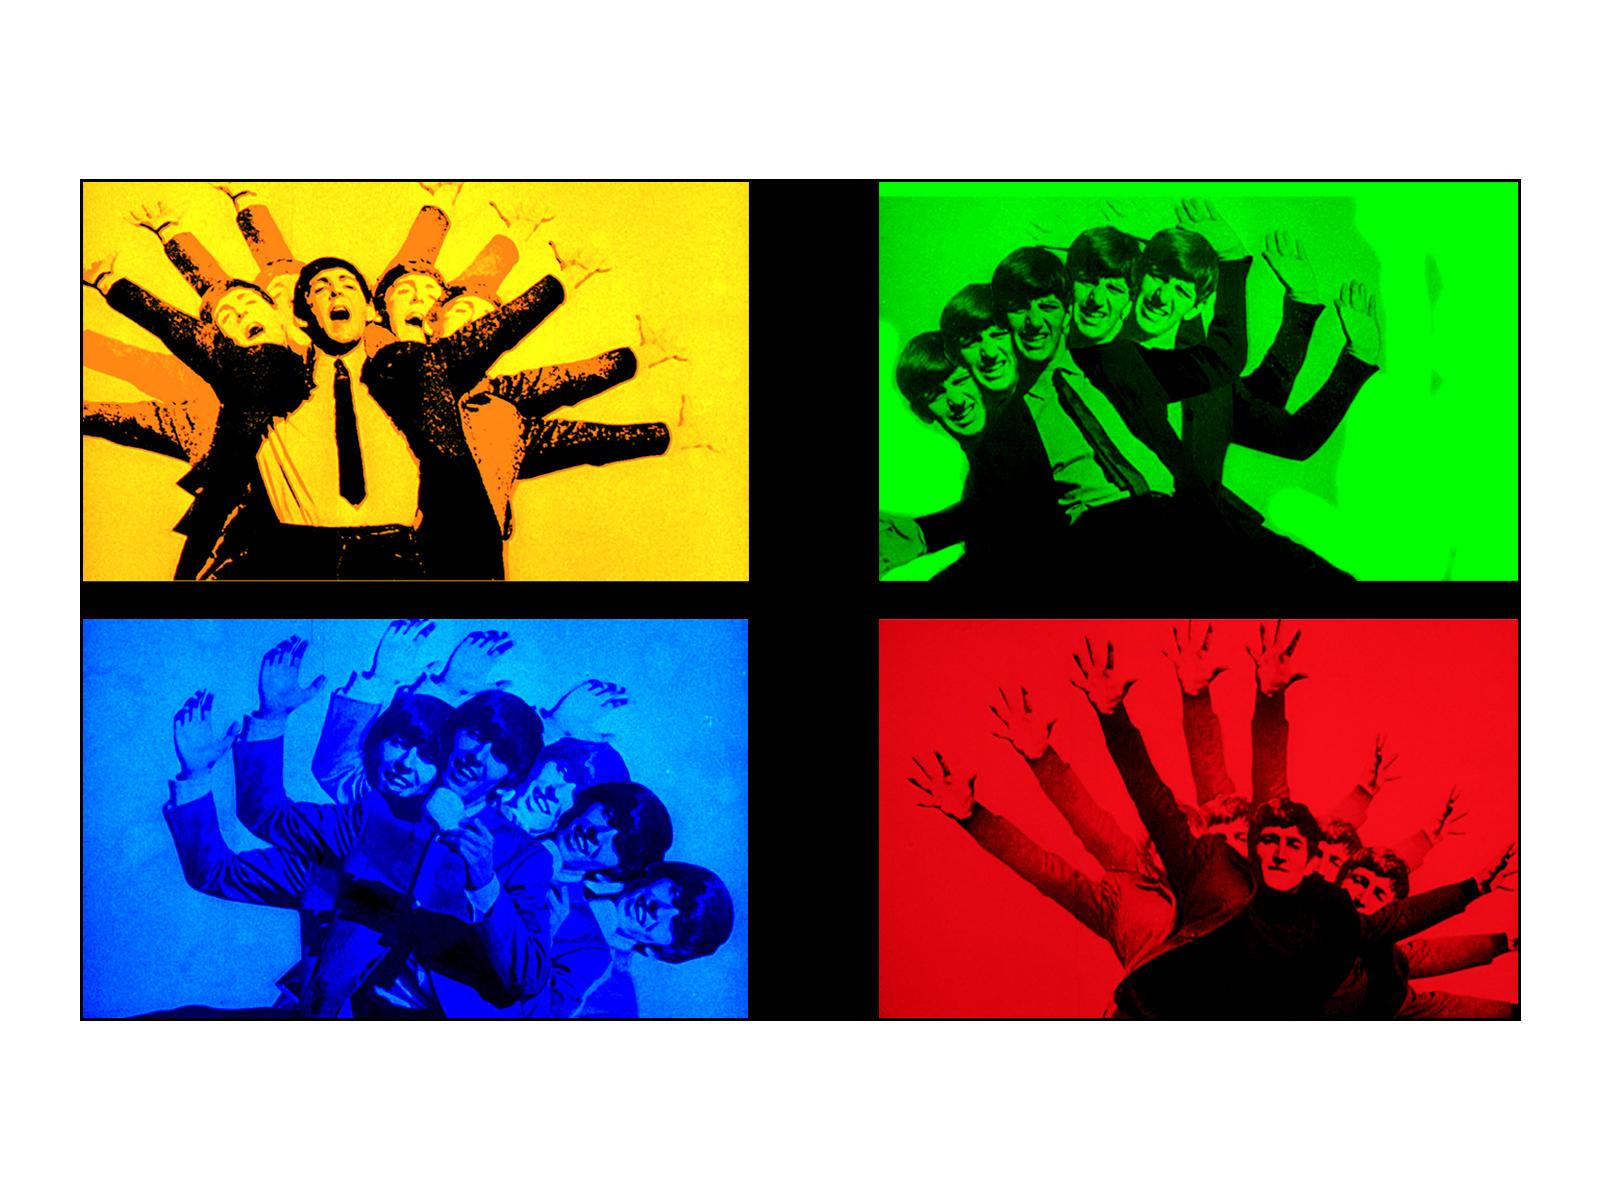 Beatles Wallpaper By Mothernaturesson